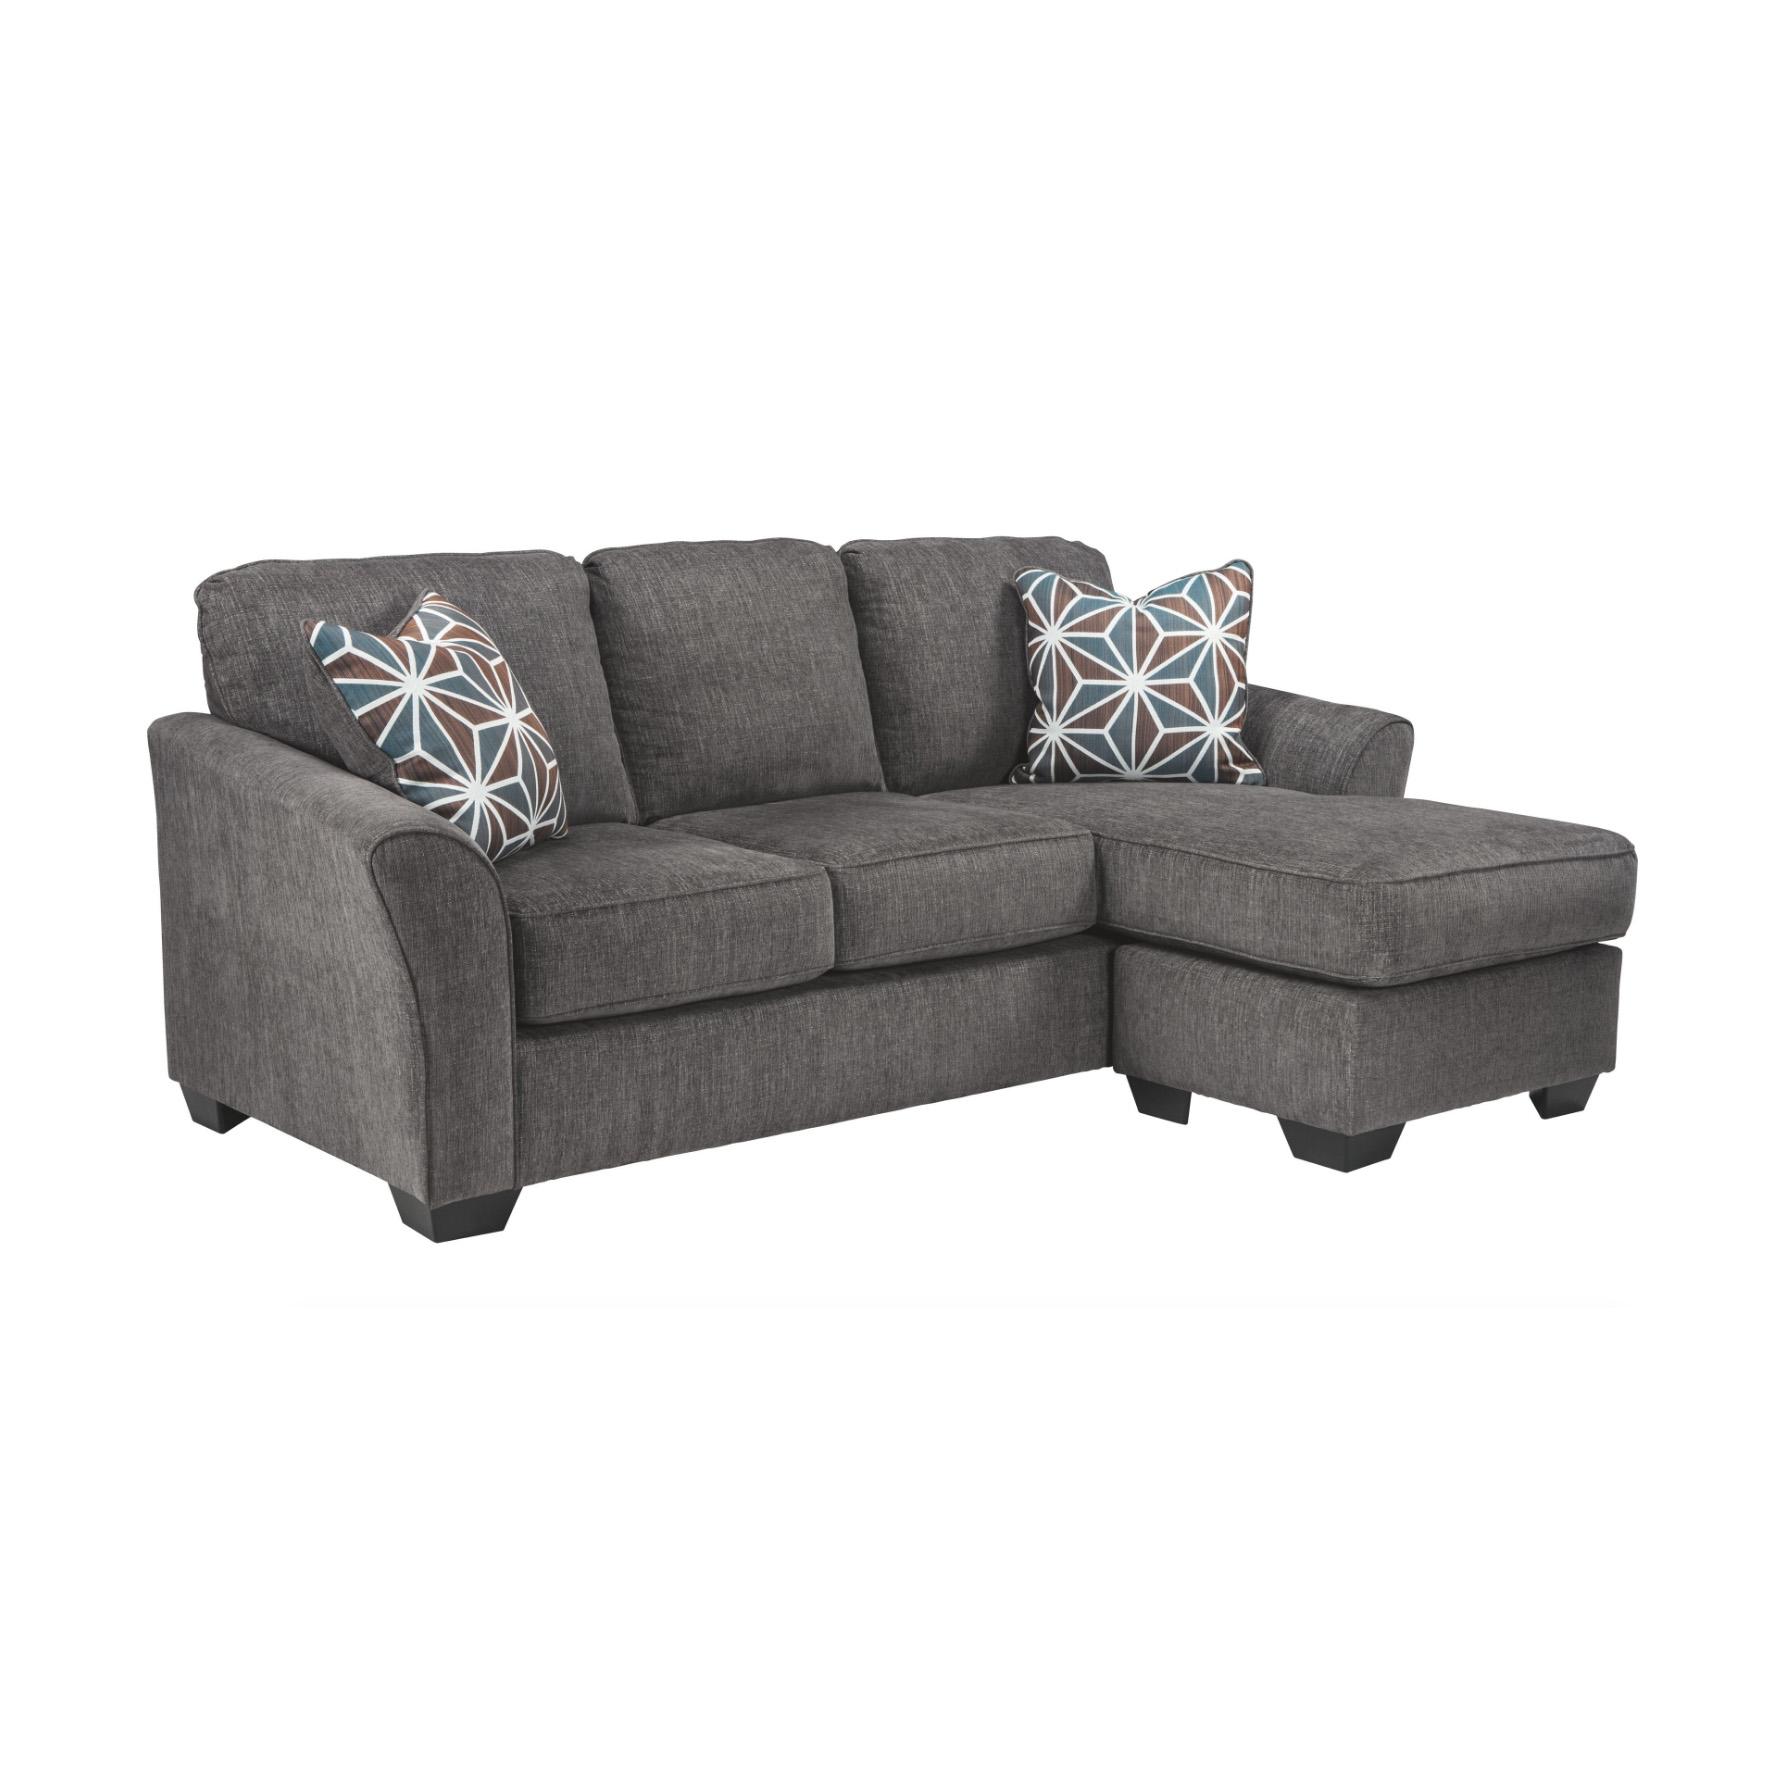 Brise - Slate - Sofa Chaise